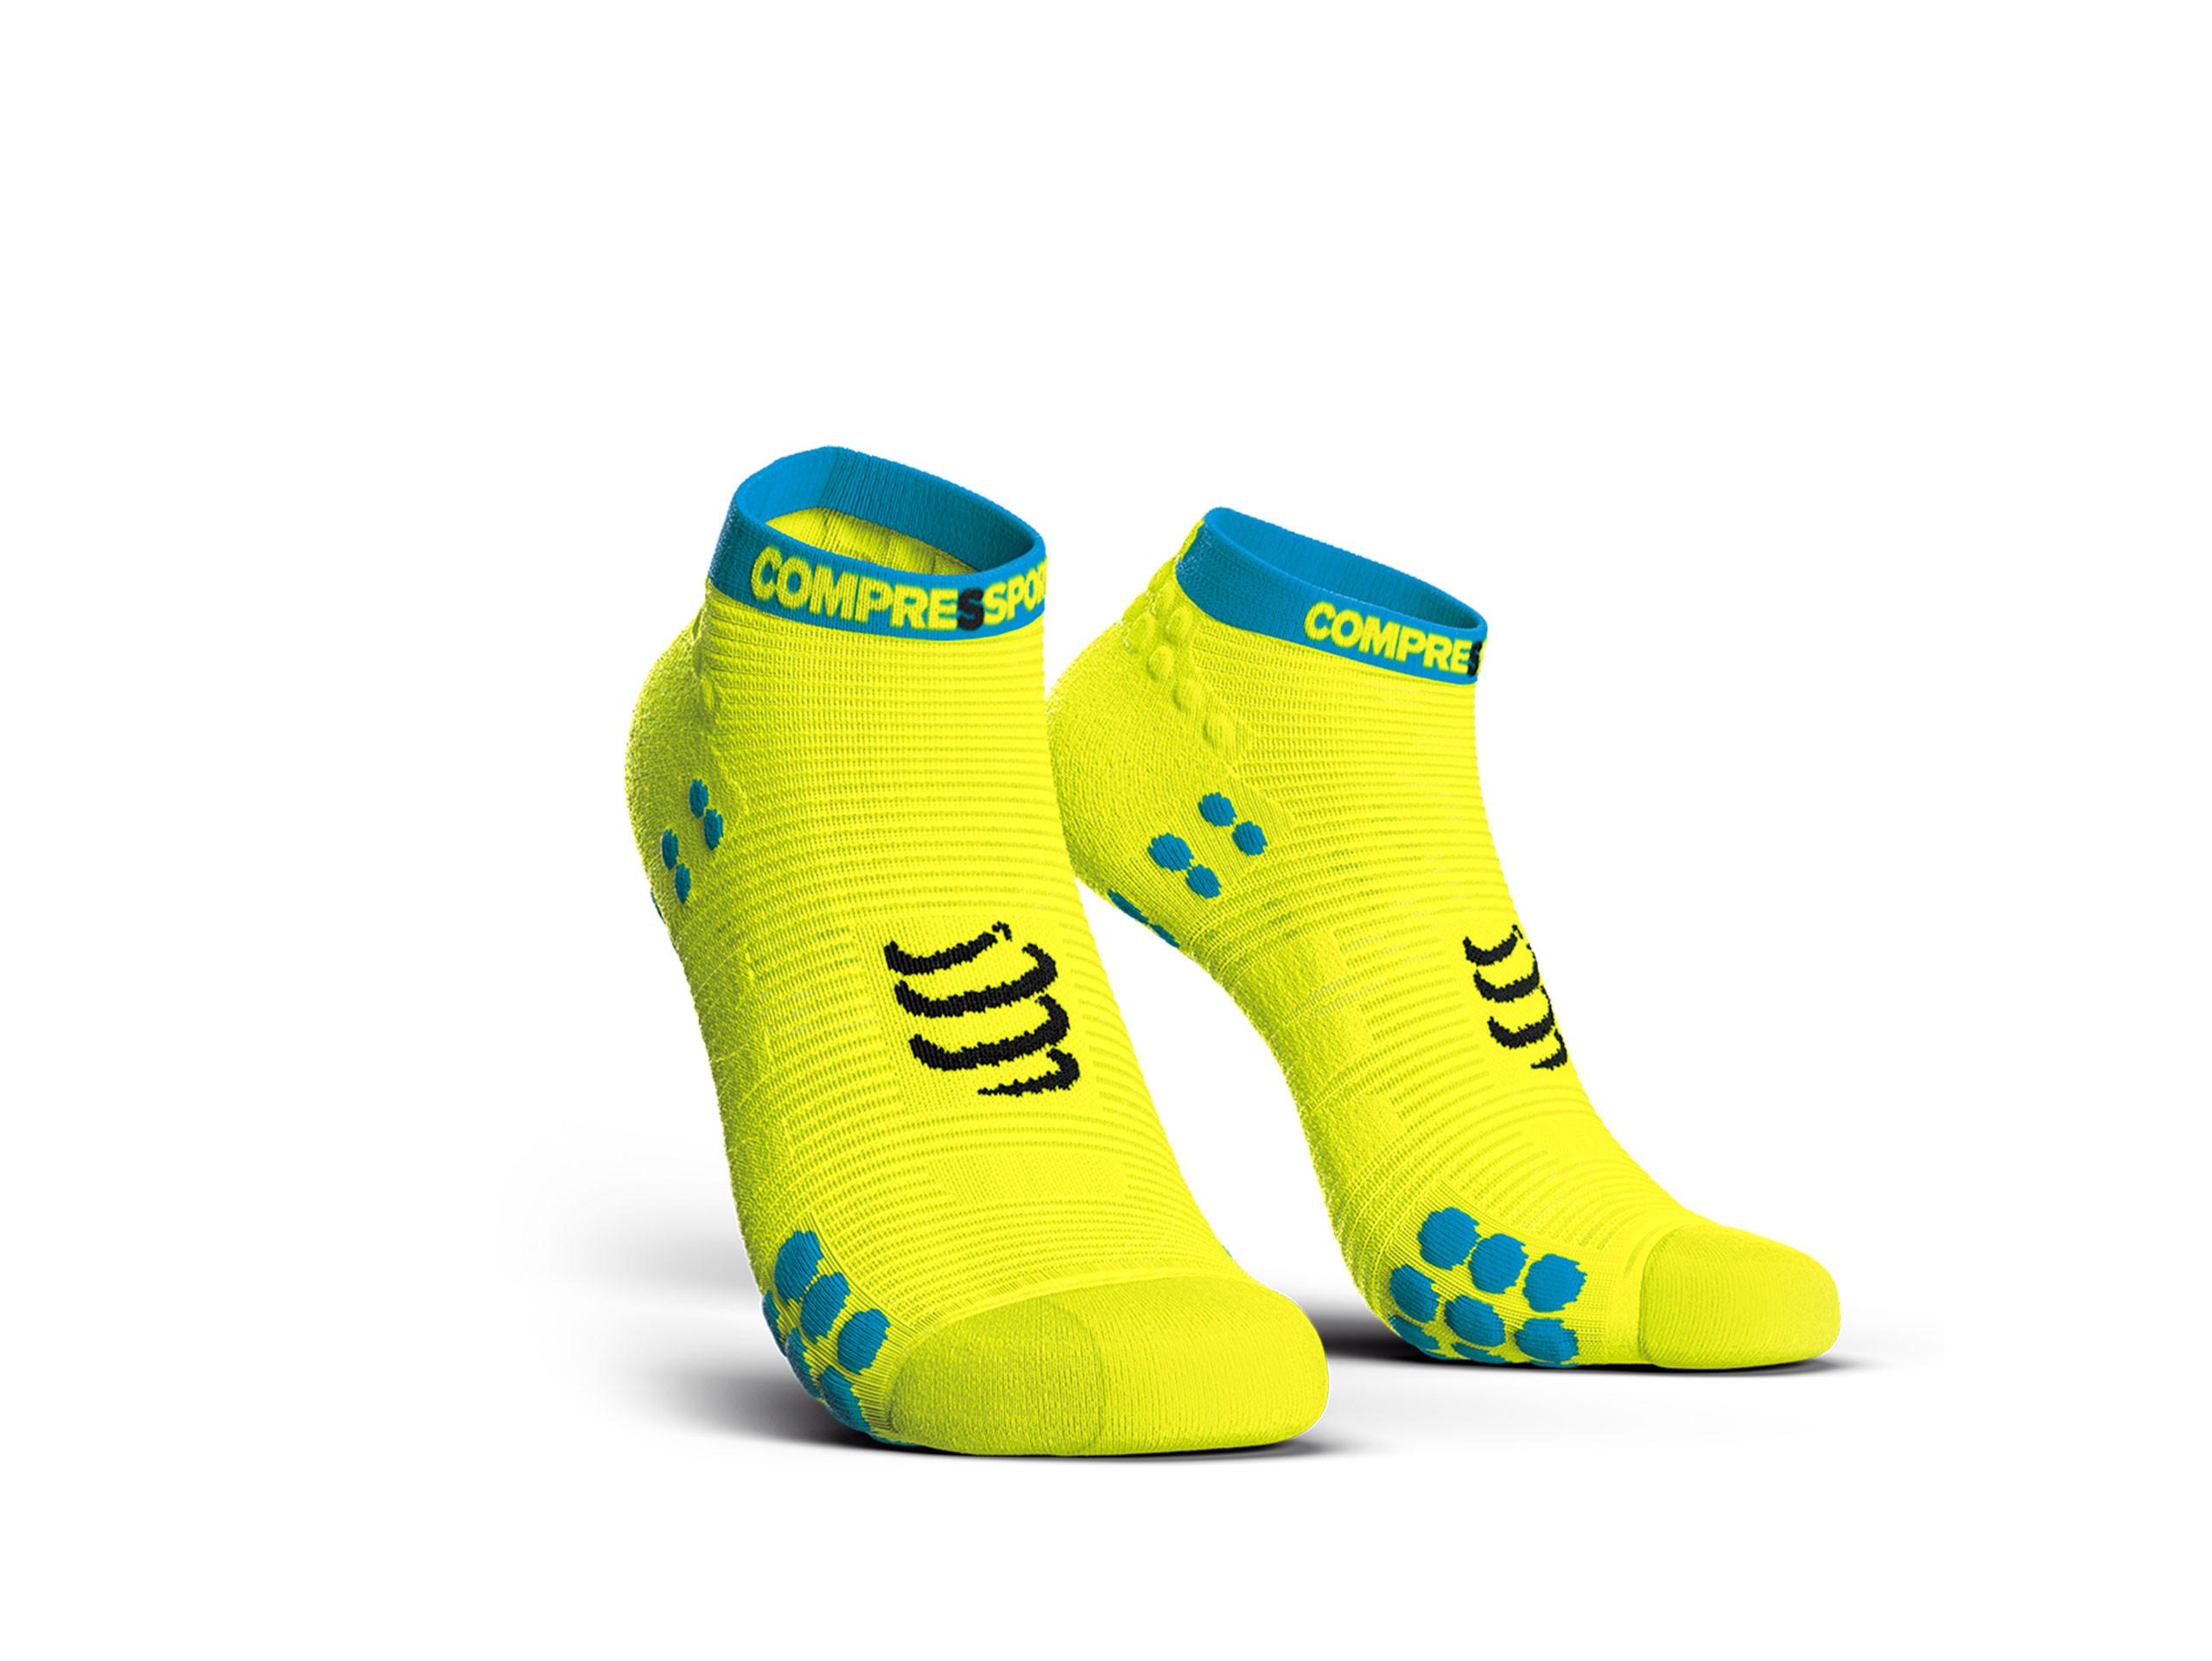 Calcetines deportivos pro v3.0 Run Low amarillo flúor